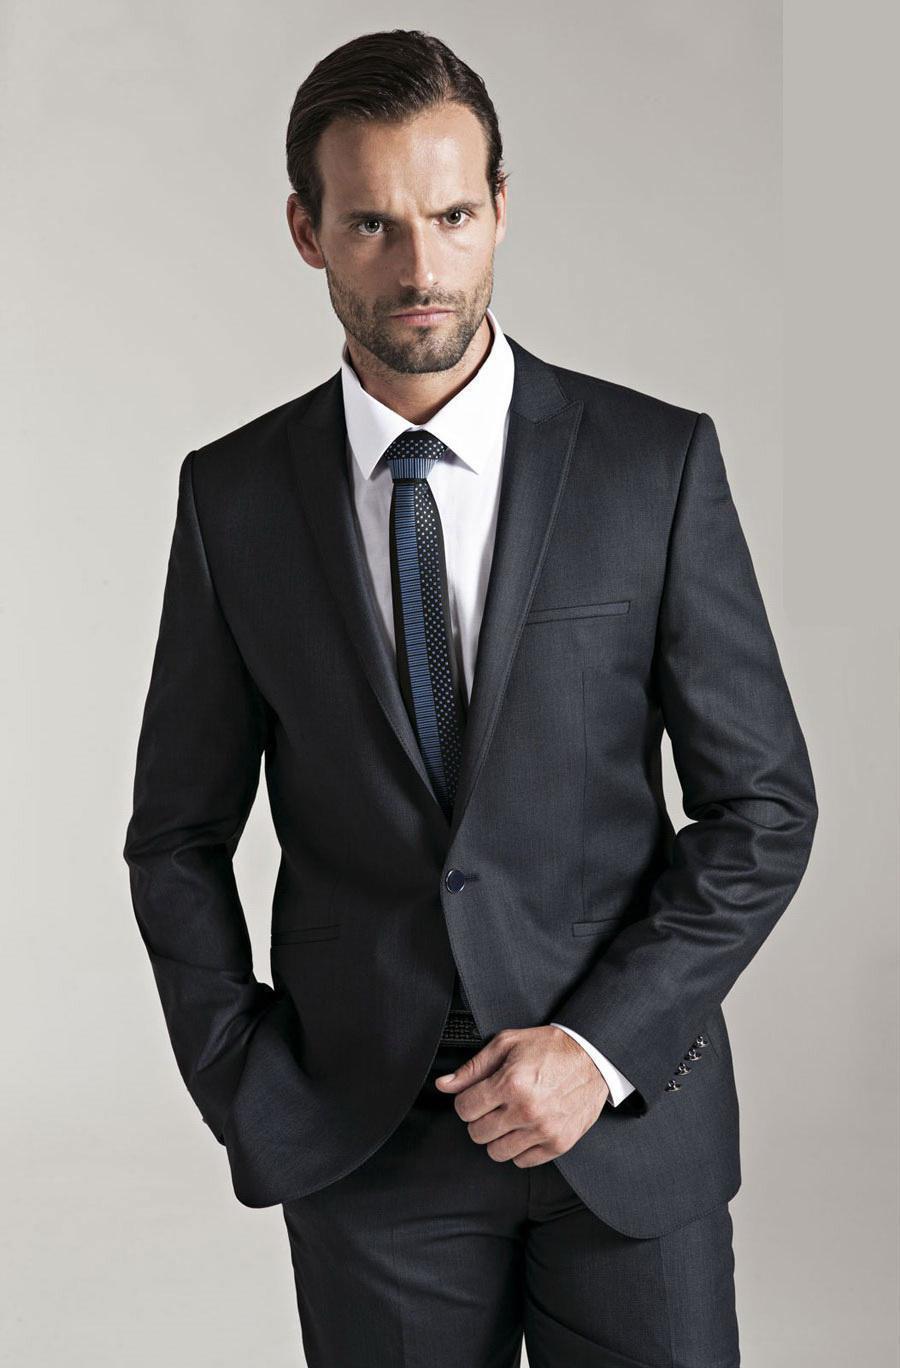 The Latest Style Clothes Suit Custom Peak Lapel Wedding Dress A ...